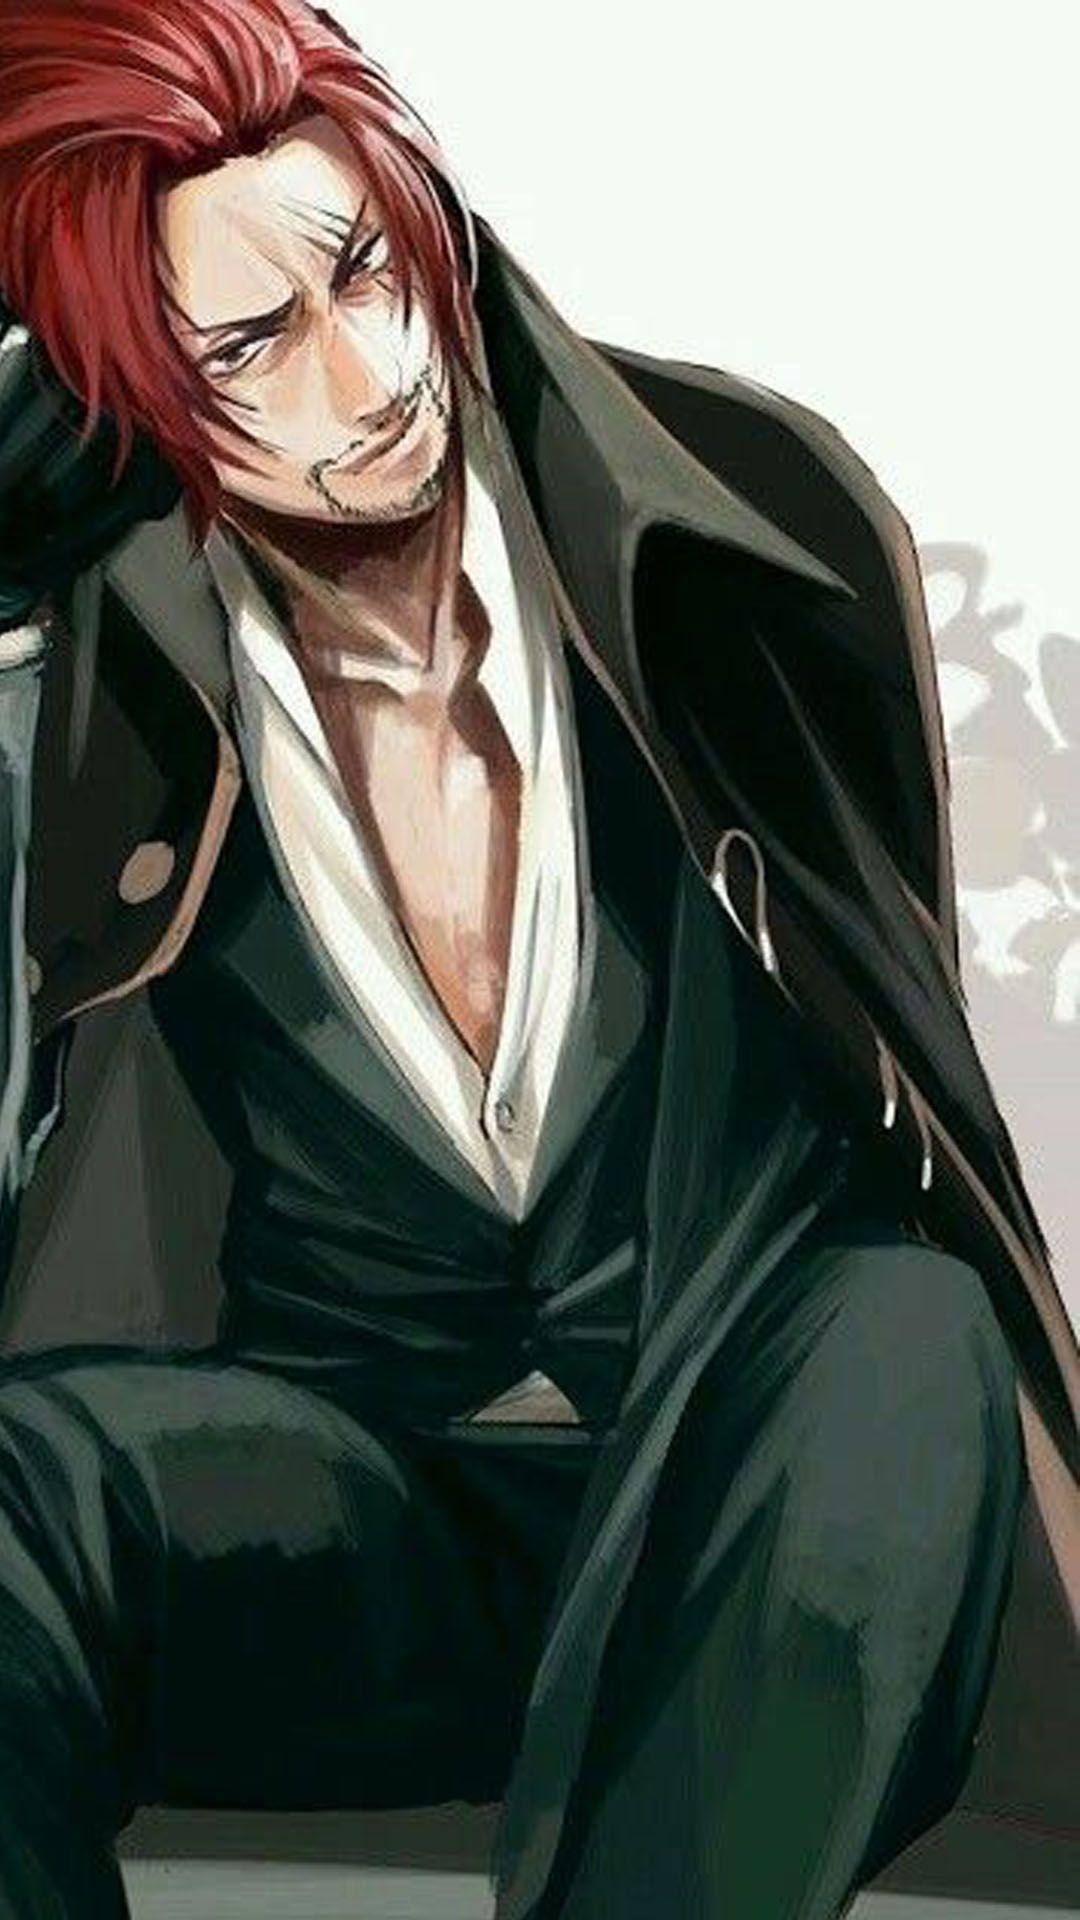 Akagami Shanks One Piece Wallpaper HD 4k